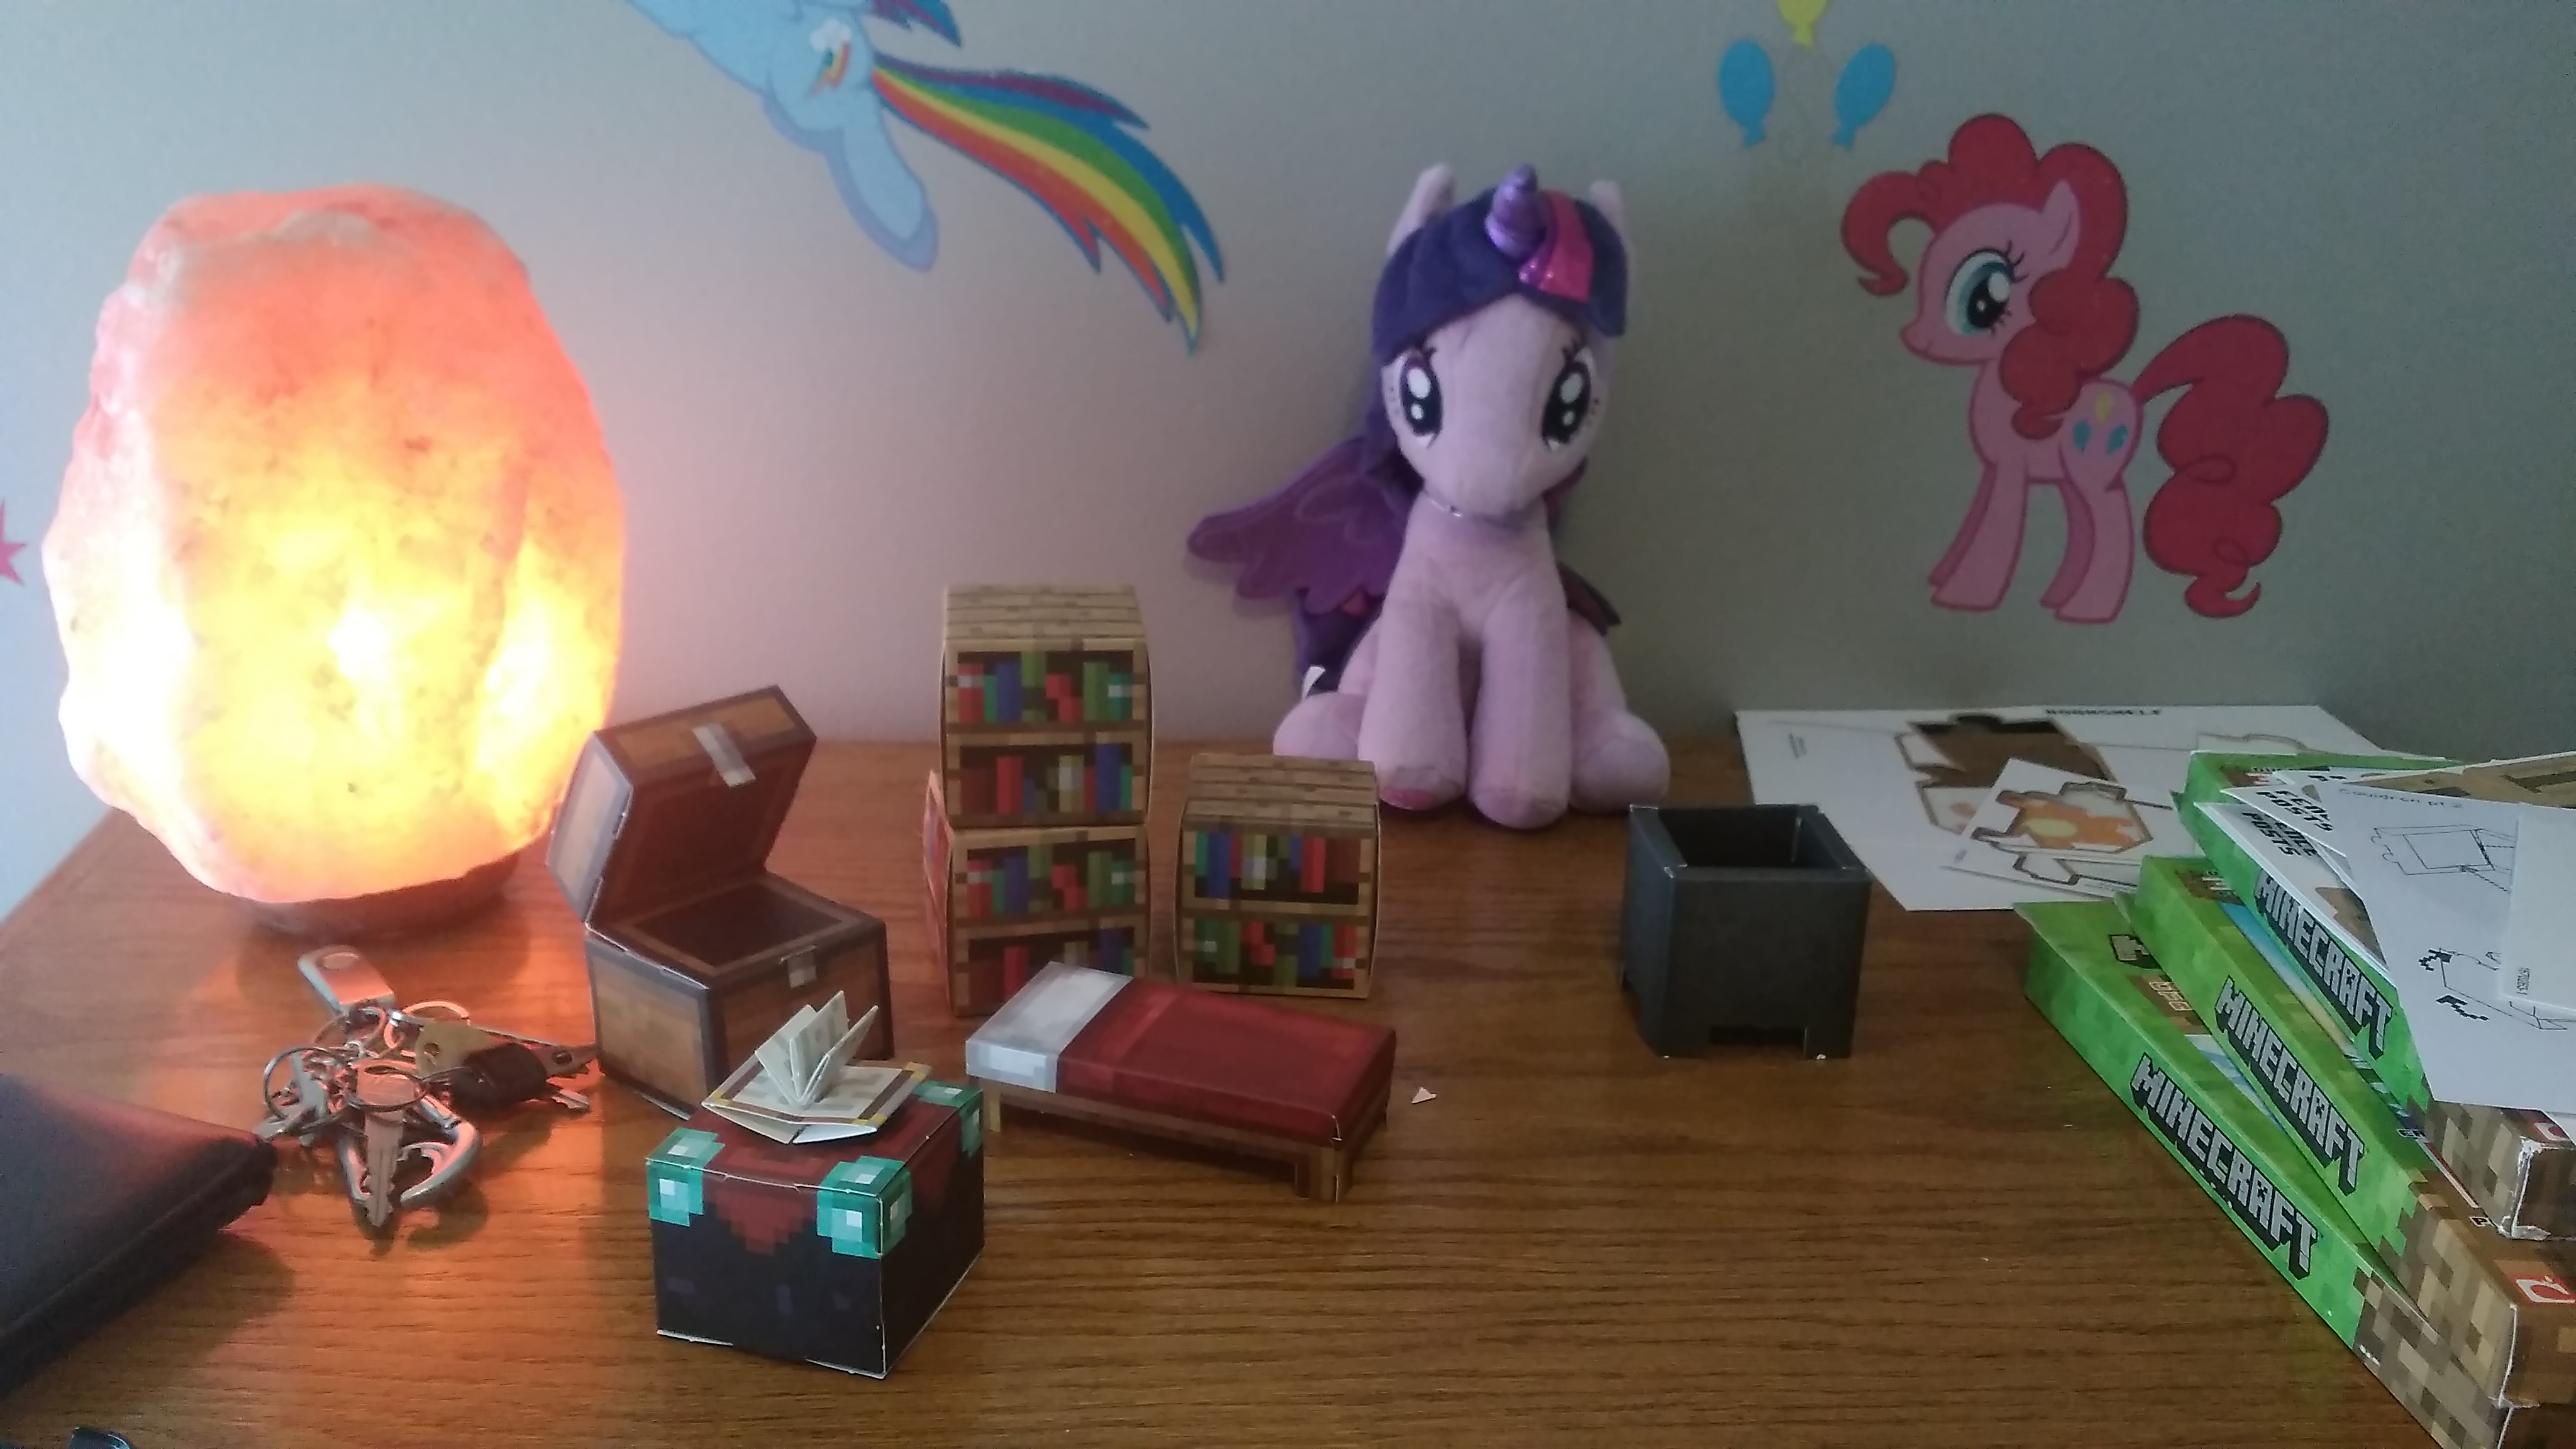 Minecraft toy cardboard